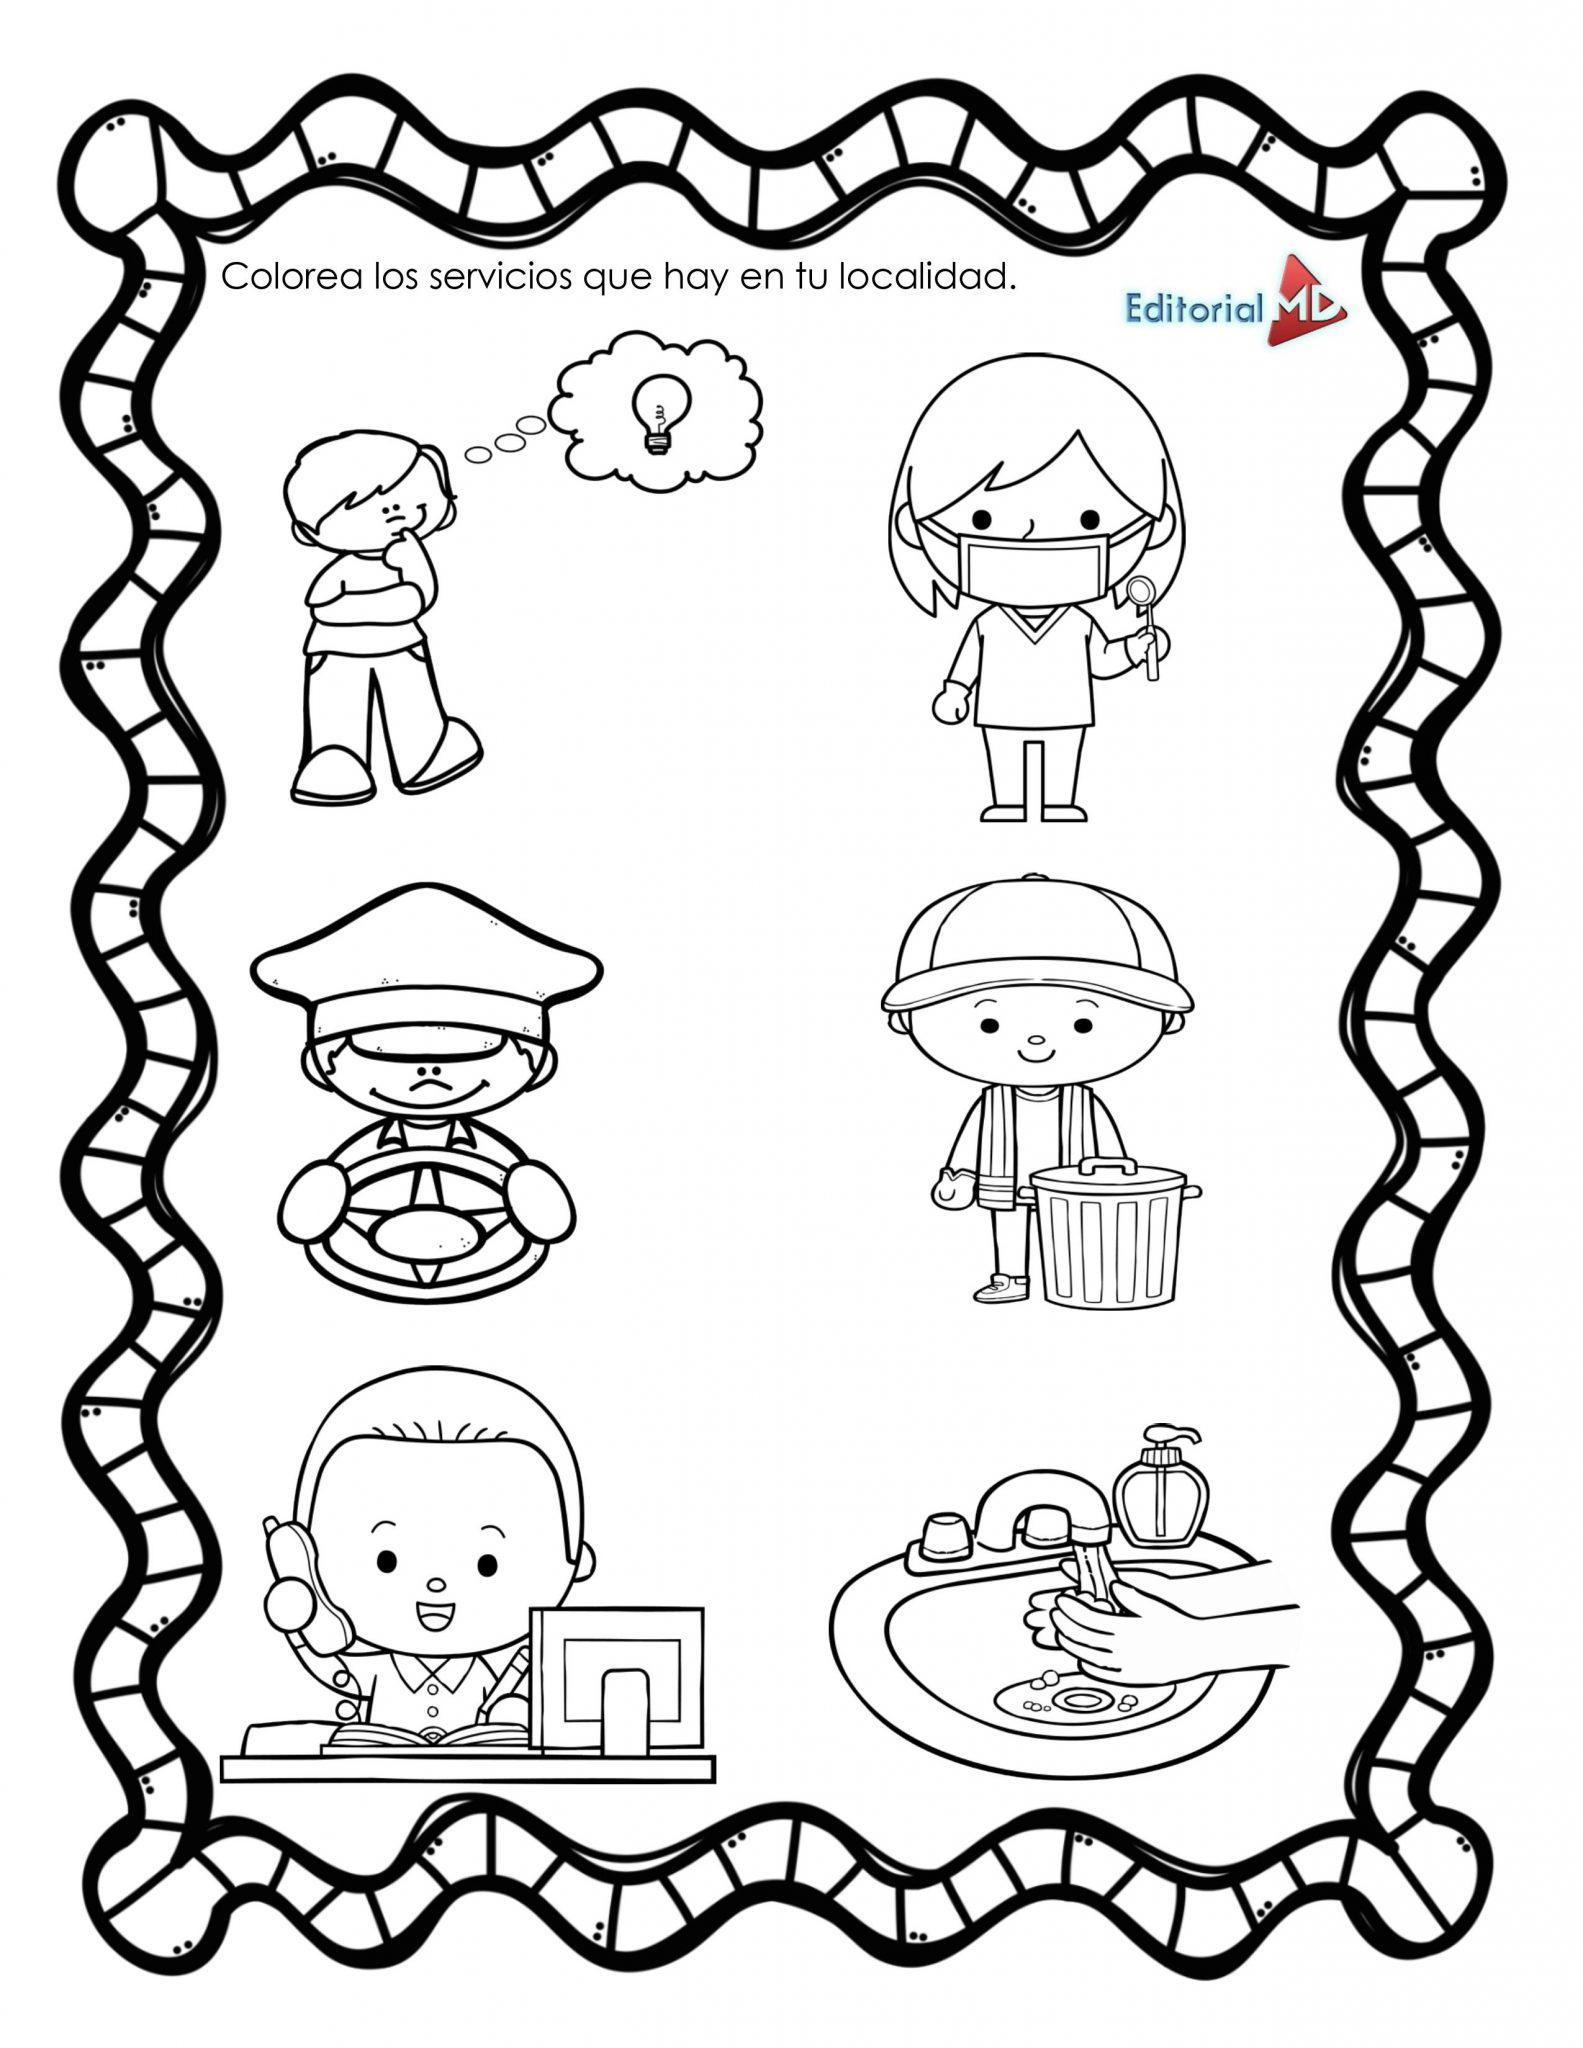 Ejemplo Material de apoyo semana 21 preescolar 02